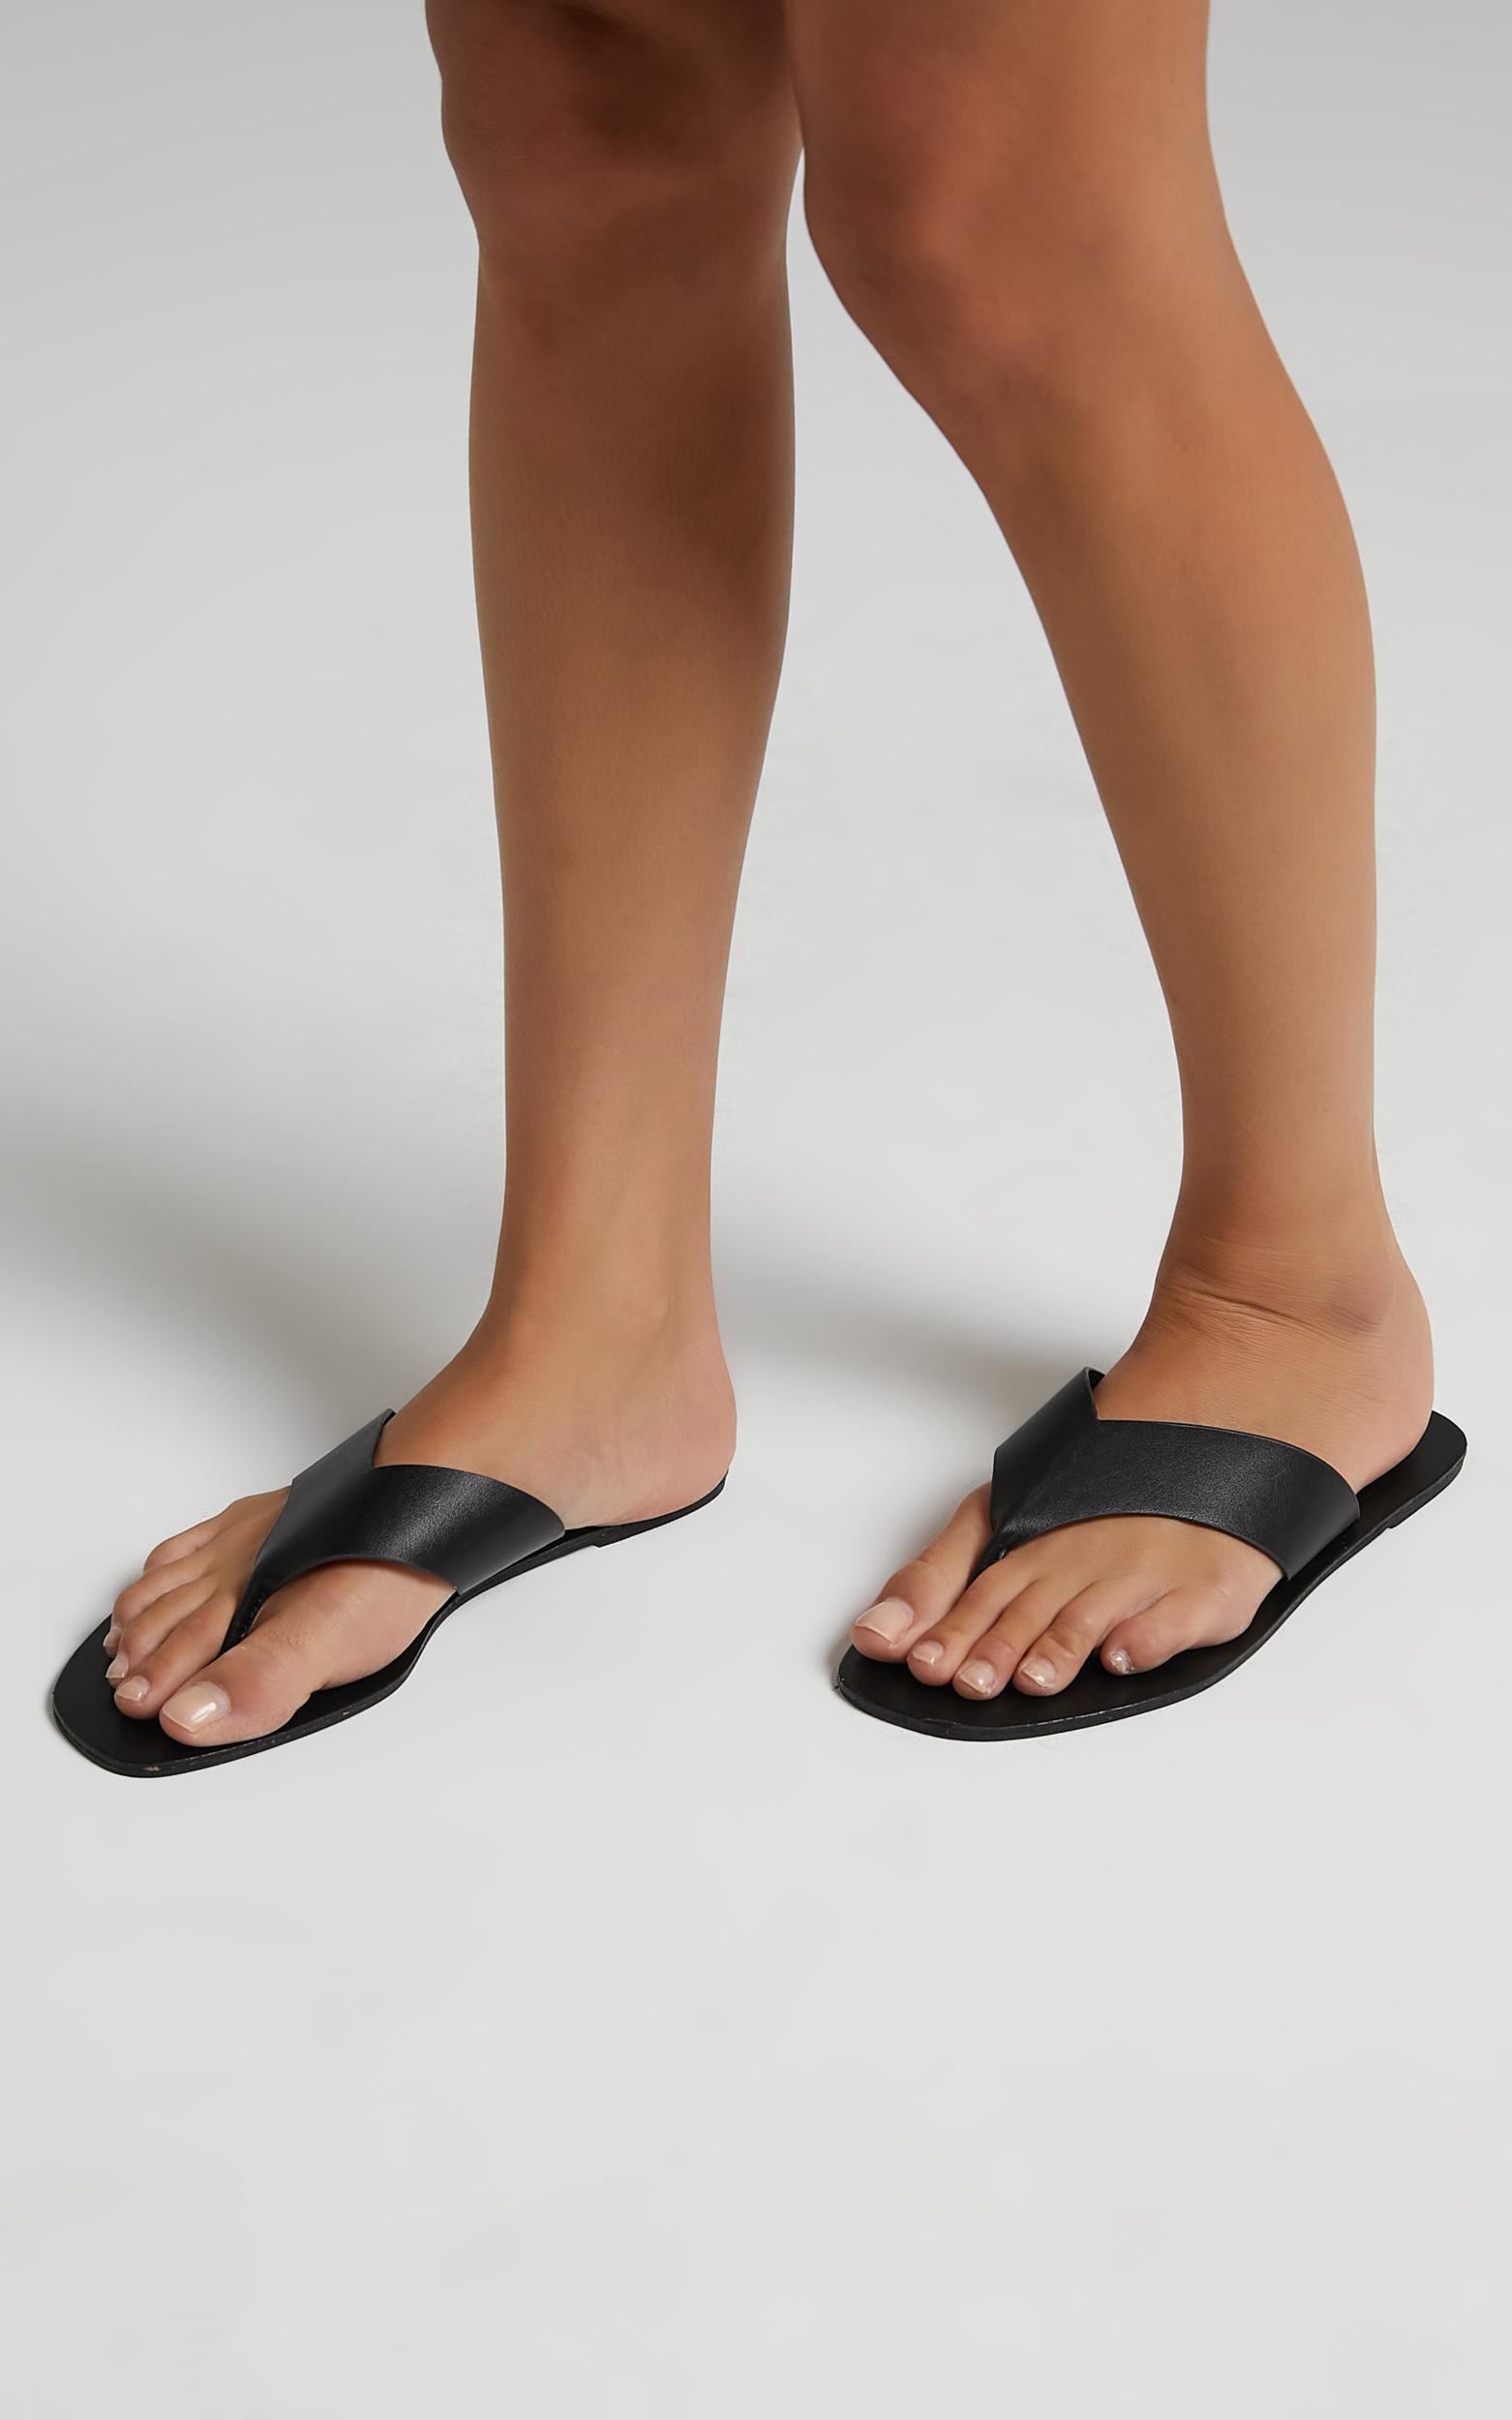 Billini - Gray Sandals in Black - 05, BLK1, hi-res image number null